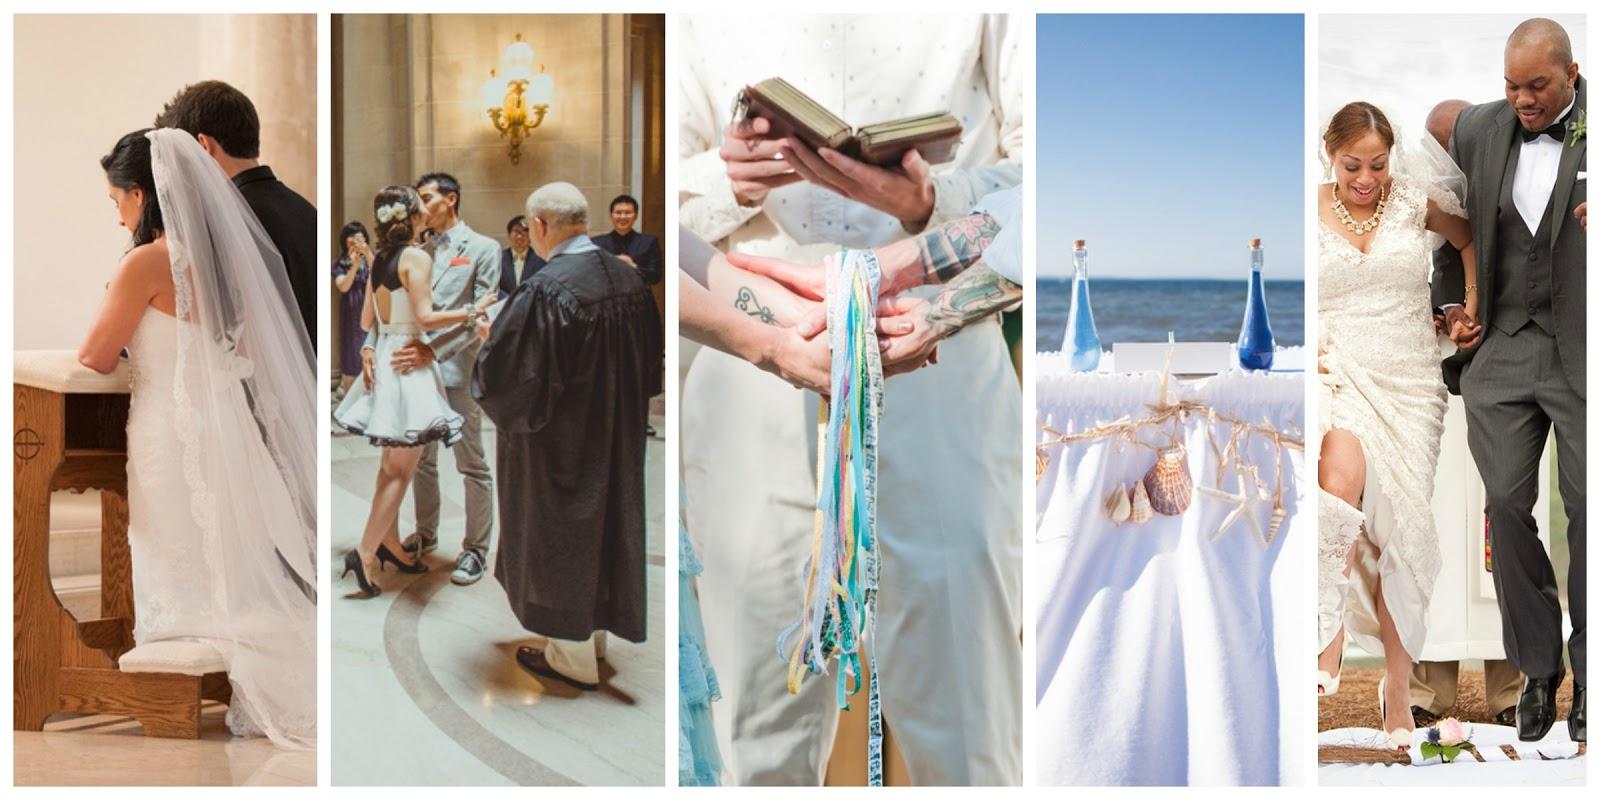 wedding ceremony archives crazyforus